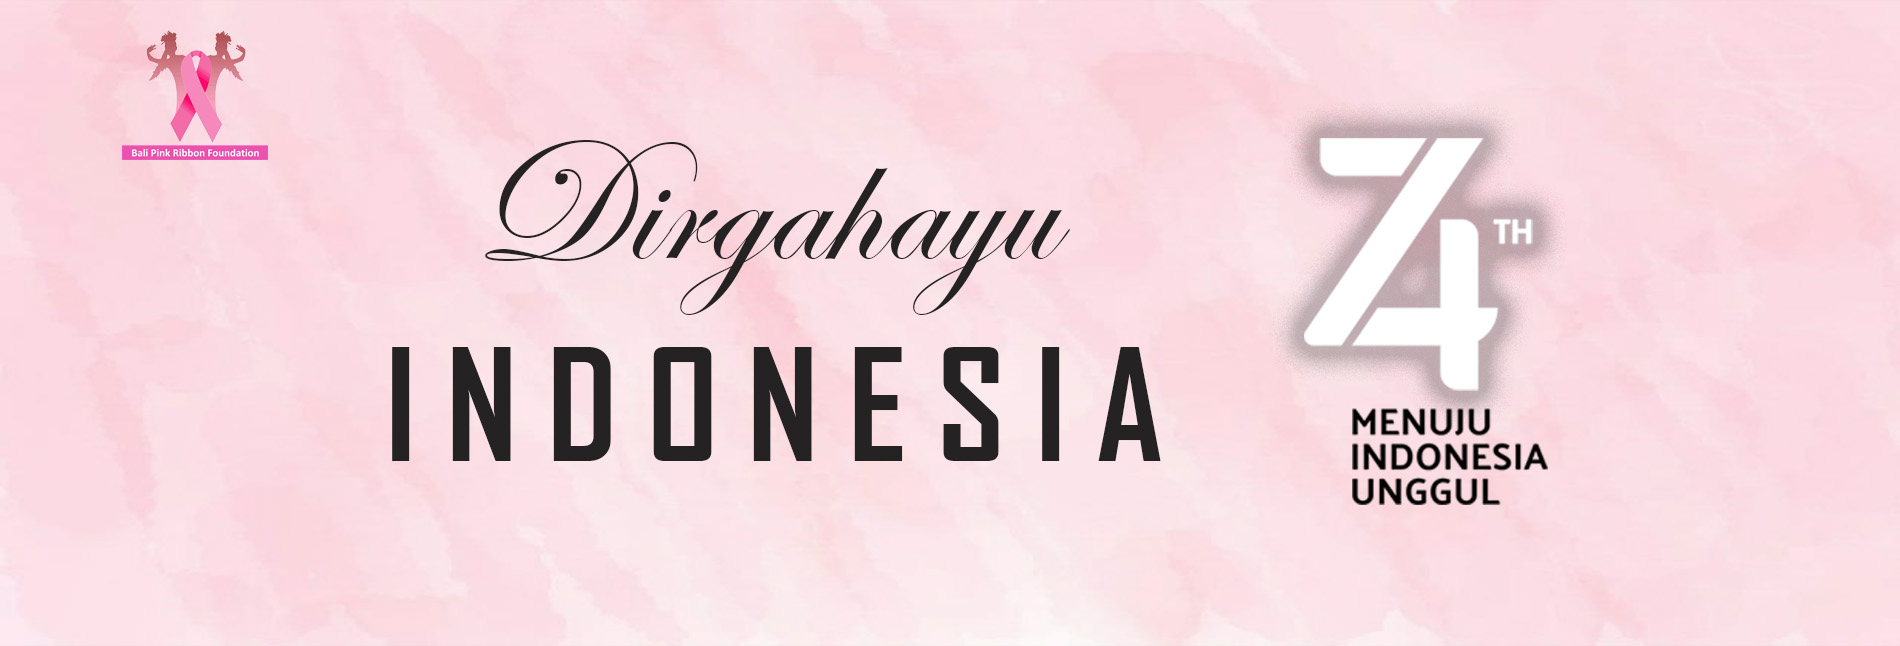 74th-indonesia2